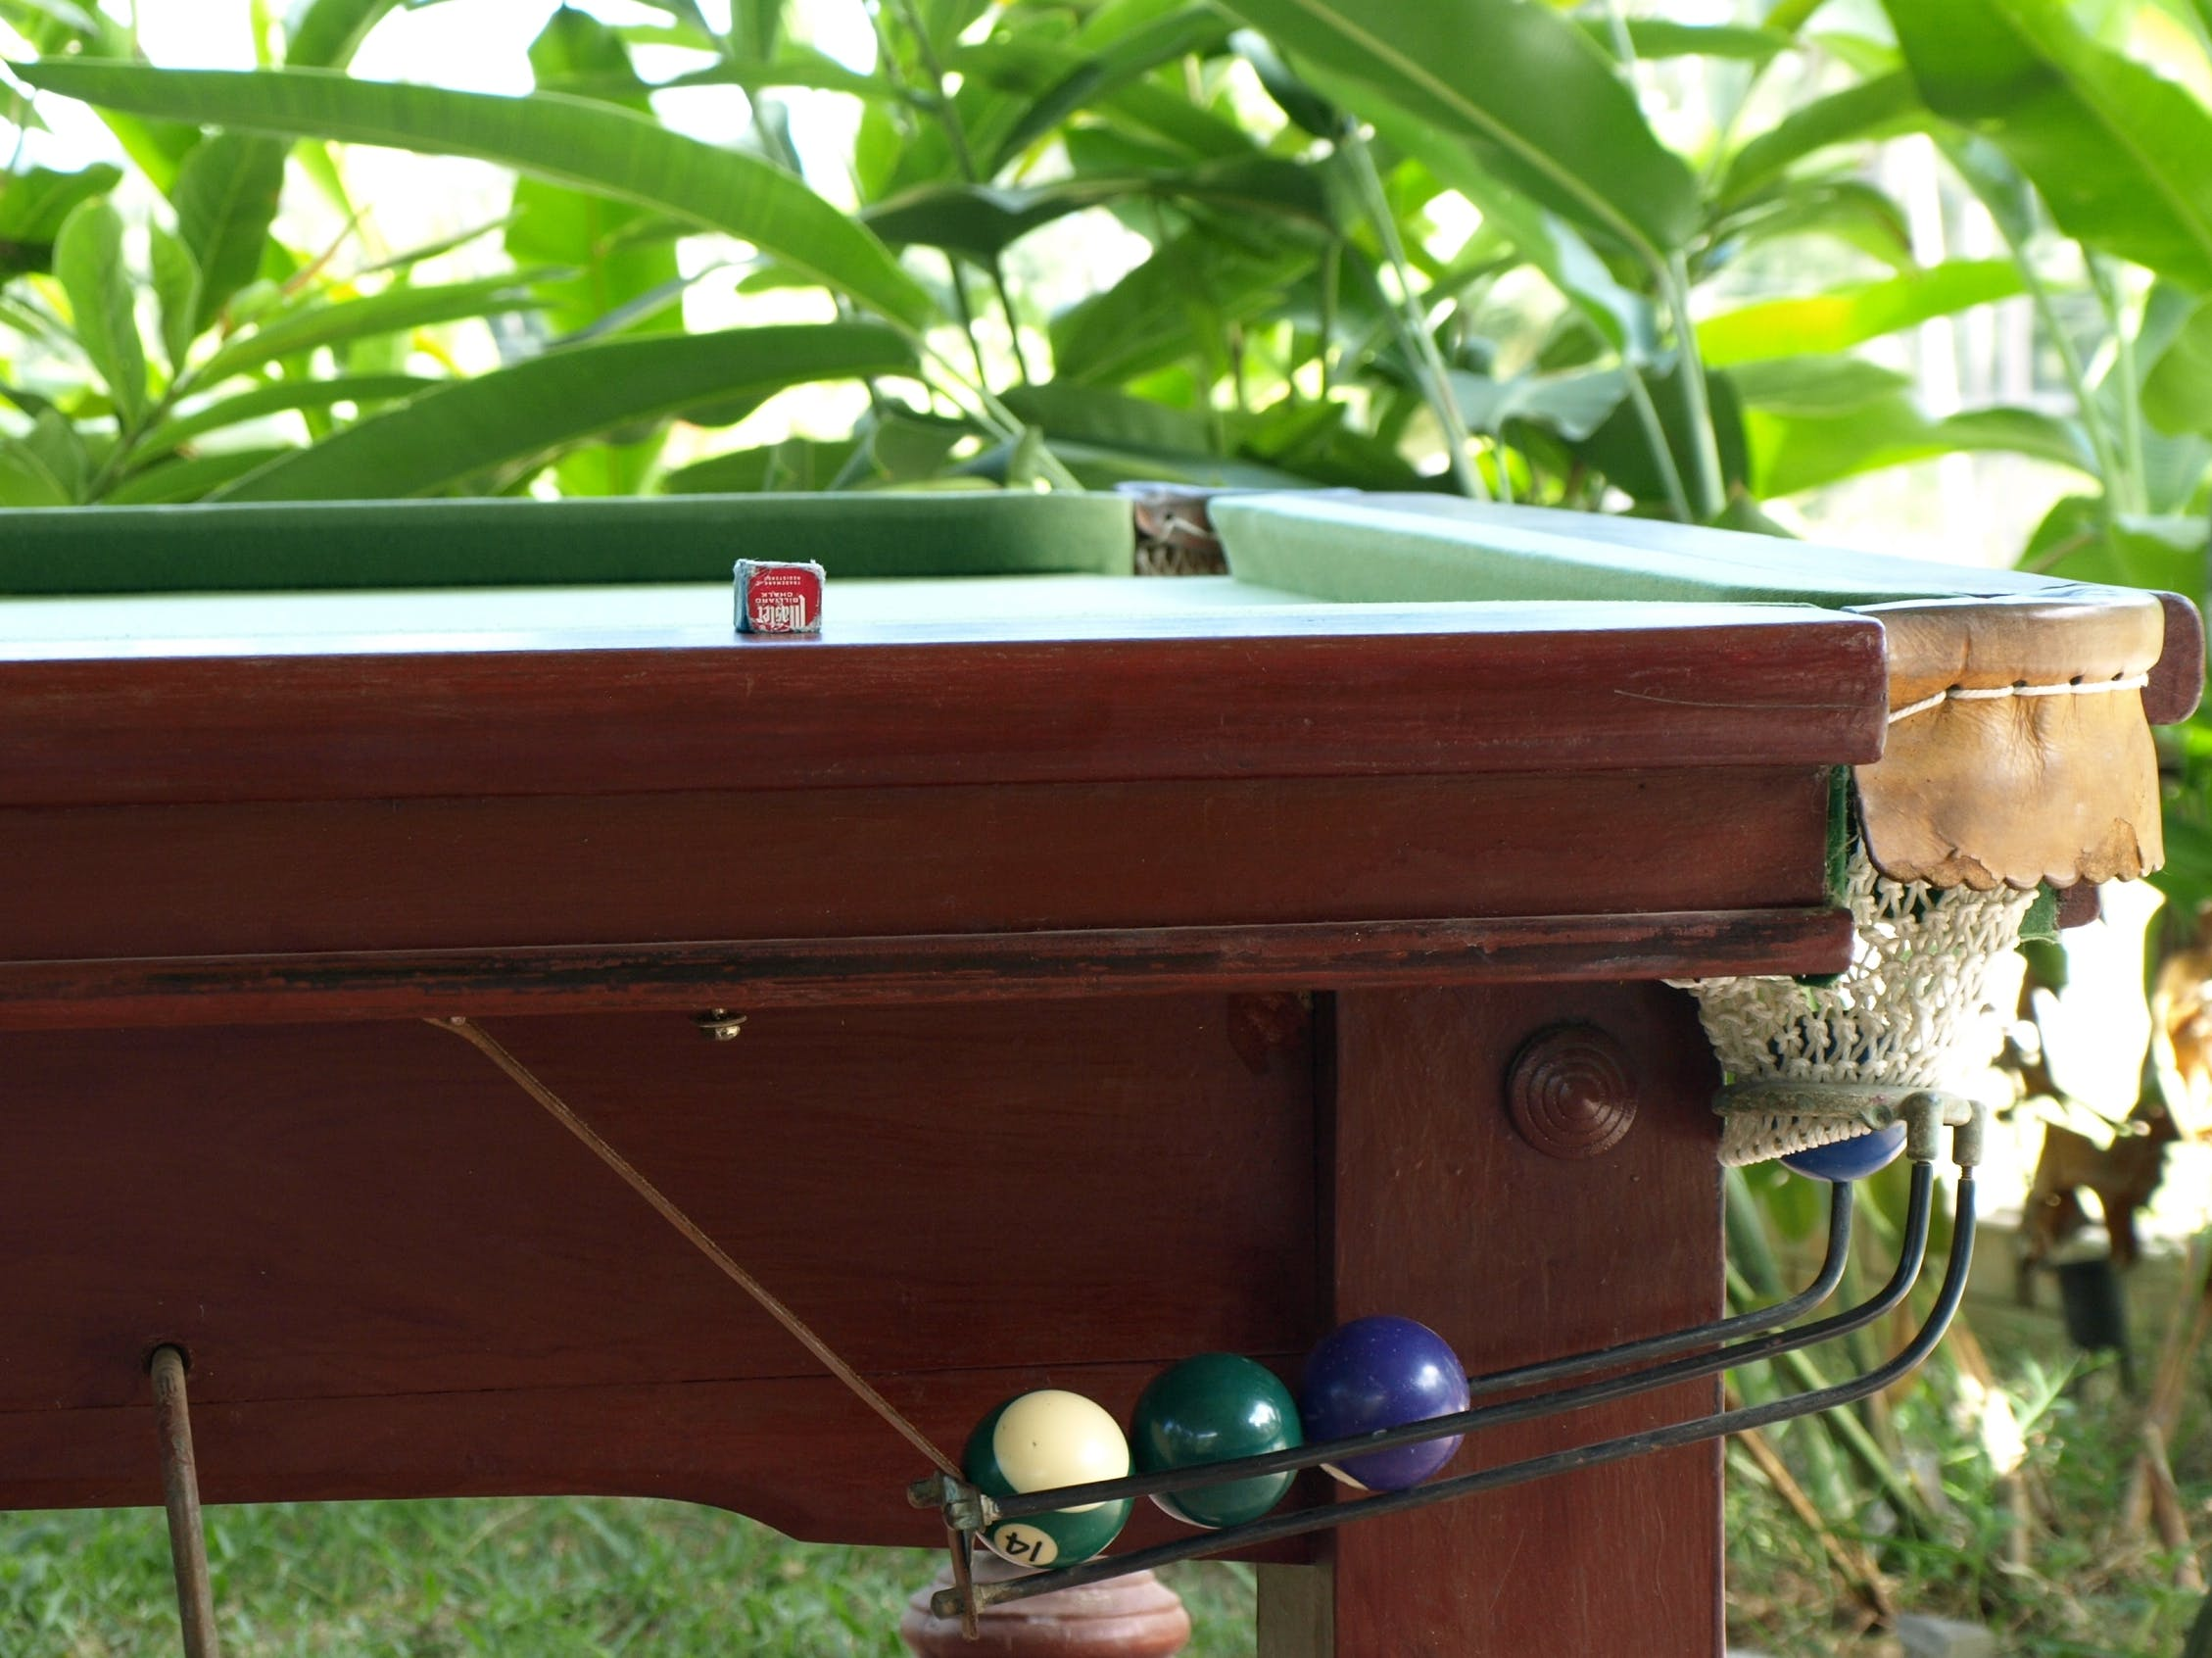 Free stock photo of outdoor, pool billiards